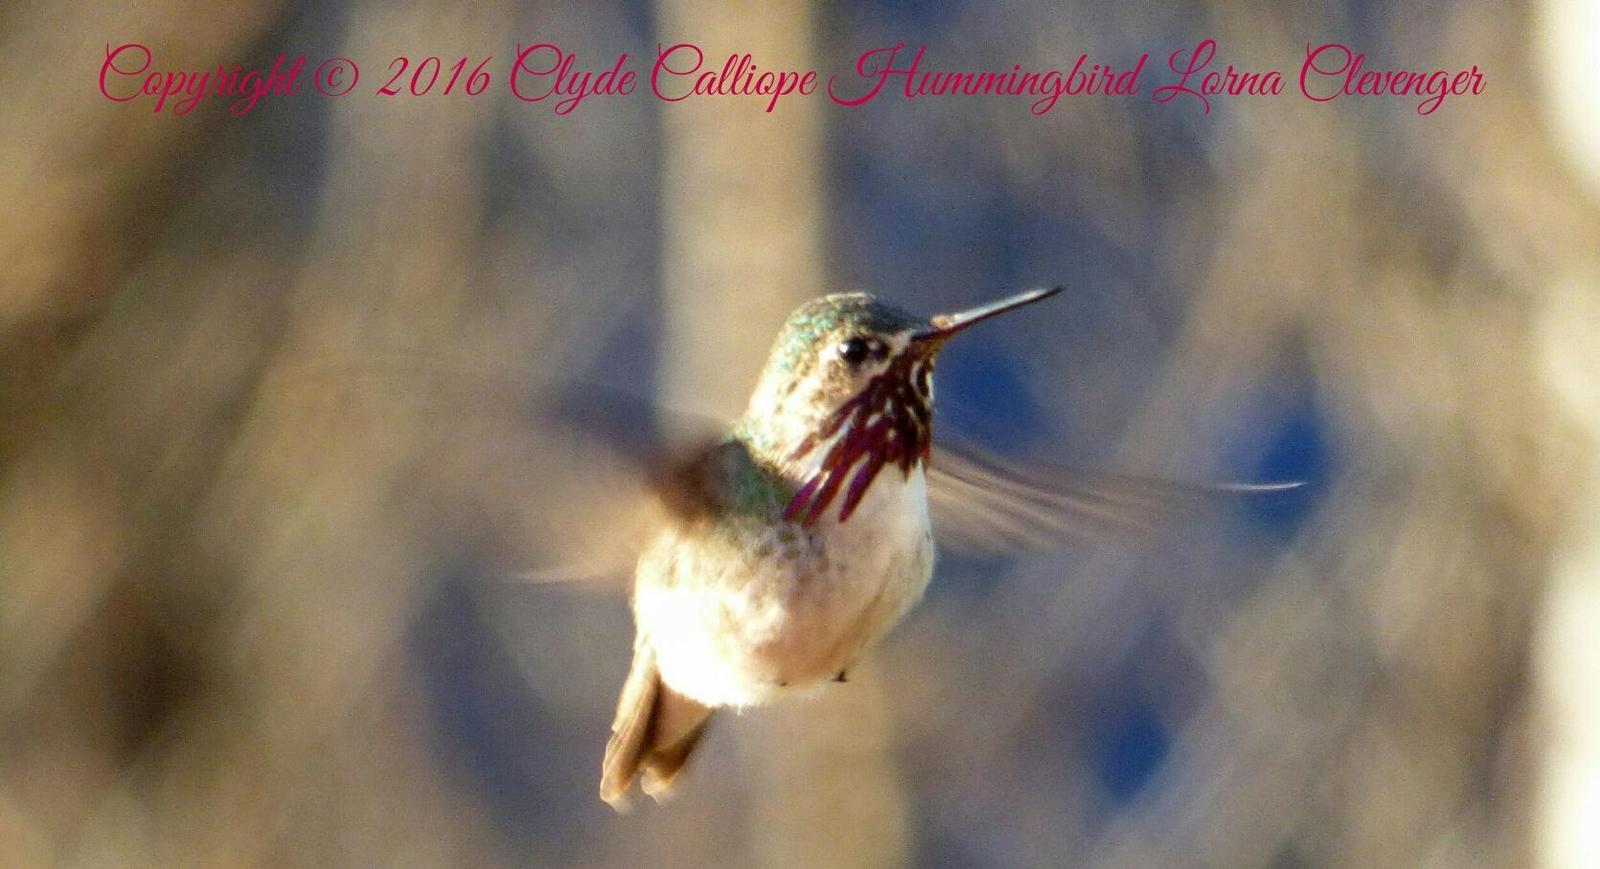 Calliope Hummingbird Photo by Lorna Clevenger